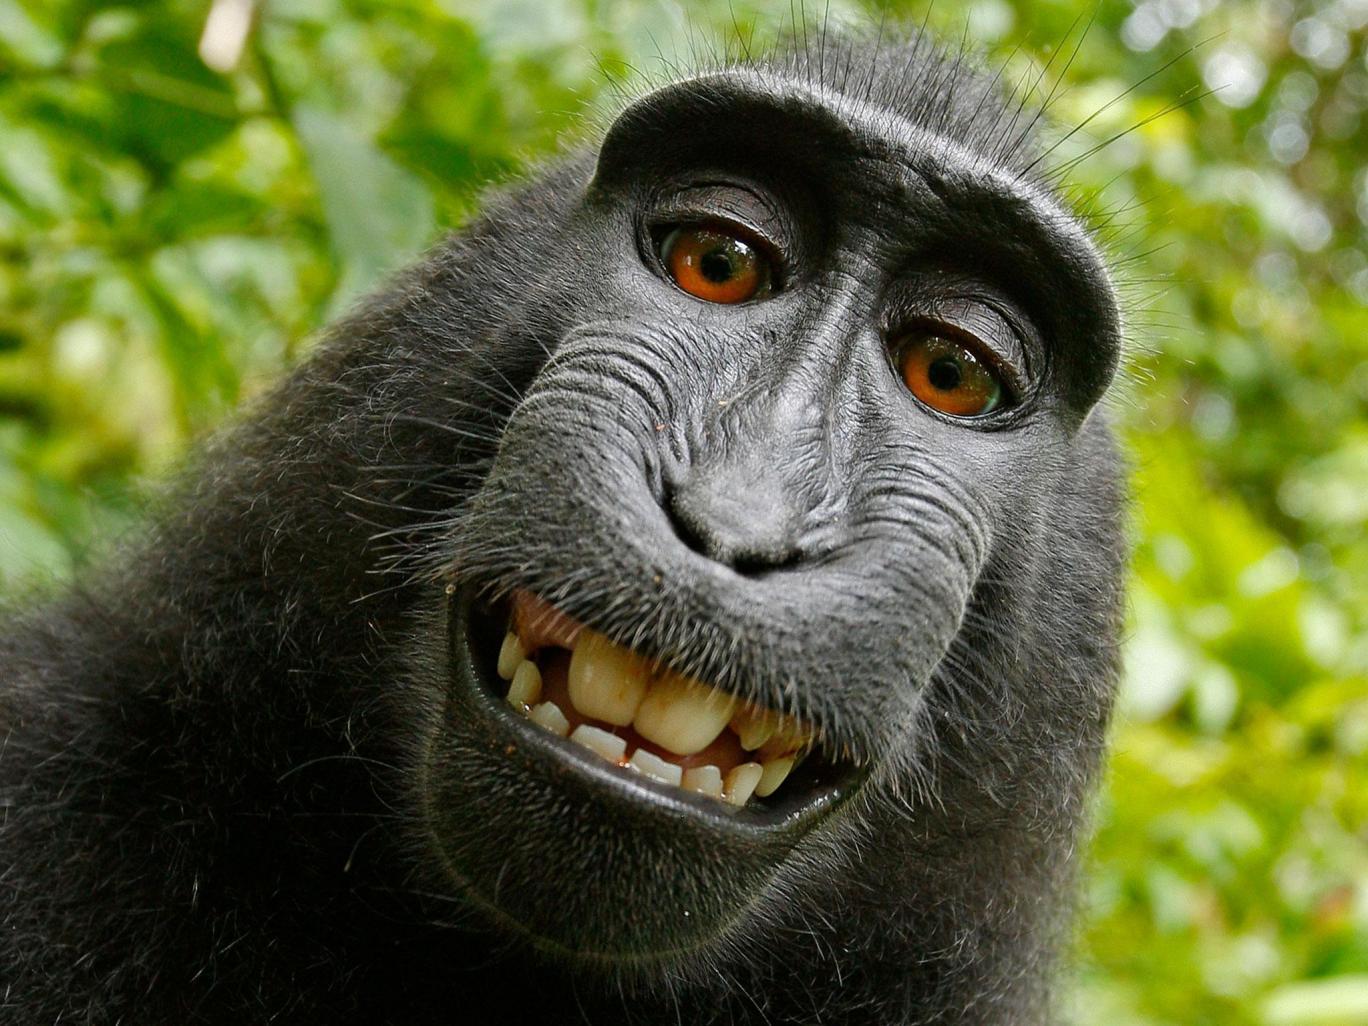 monkey selfie case photographer wins two year legal fight against peta